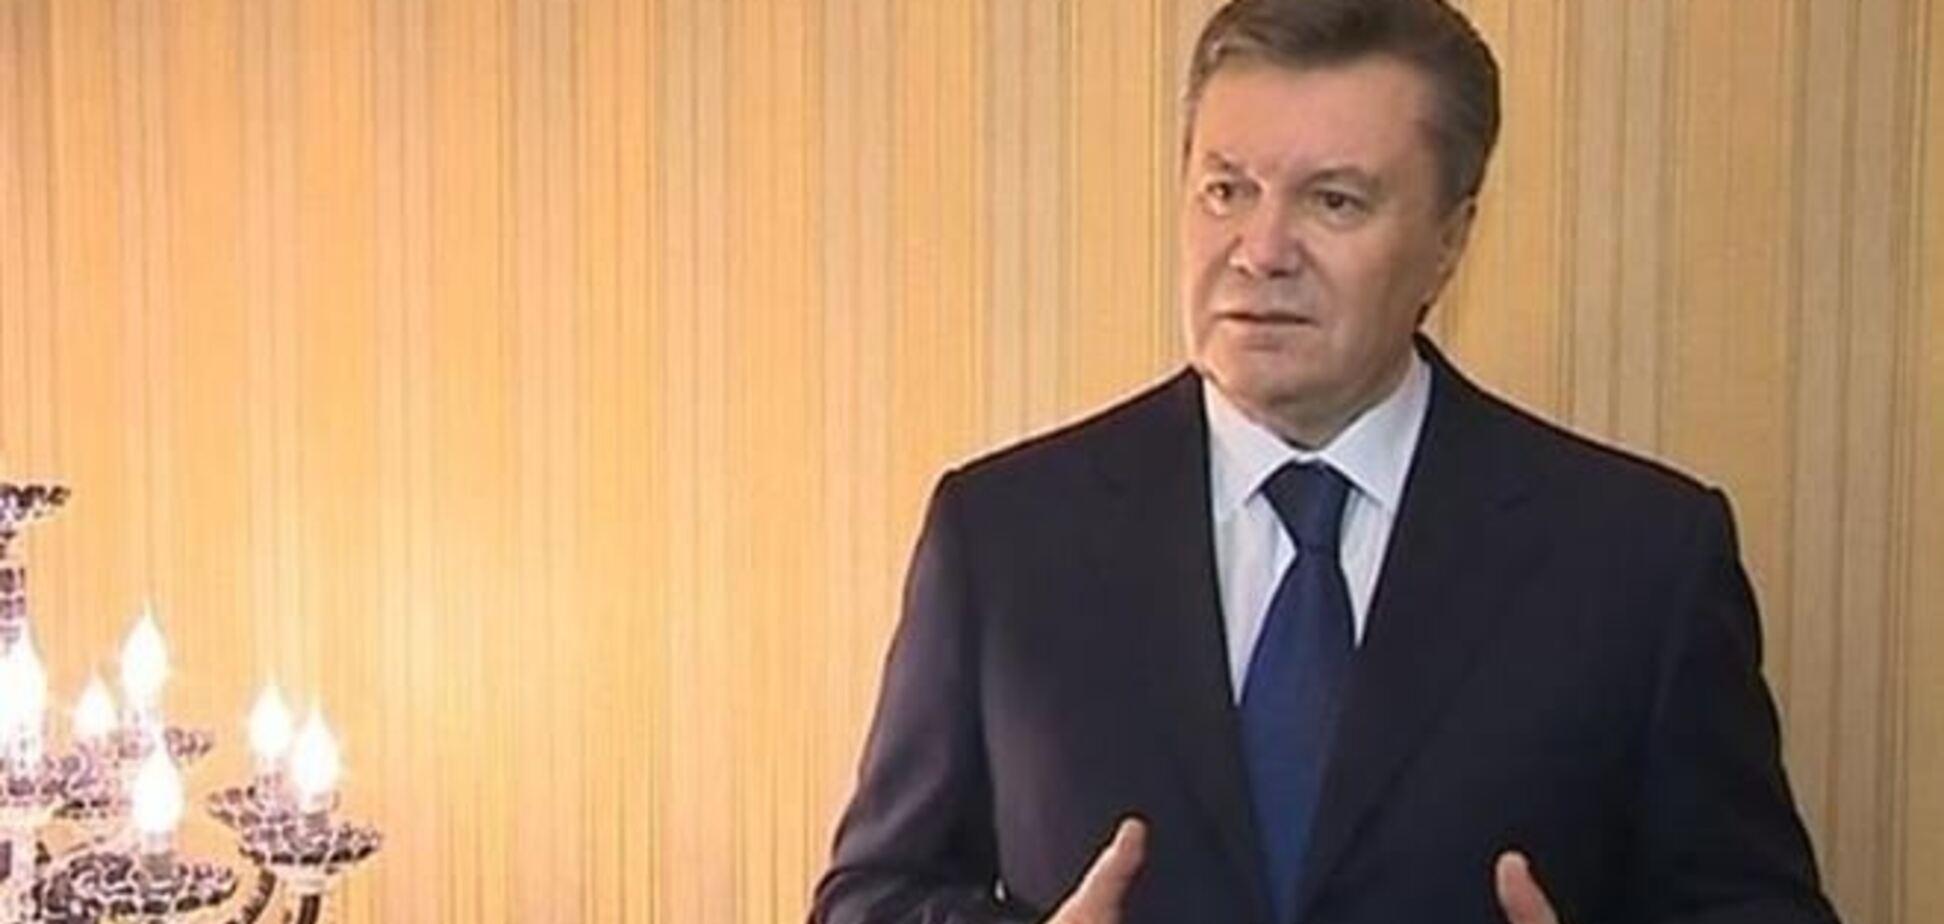 Местонахождение Януковича неизвестно, связи с ним нет – Мирошниченко